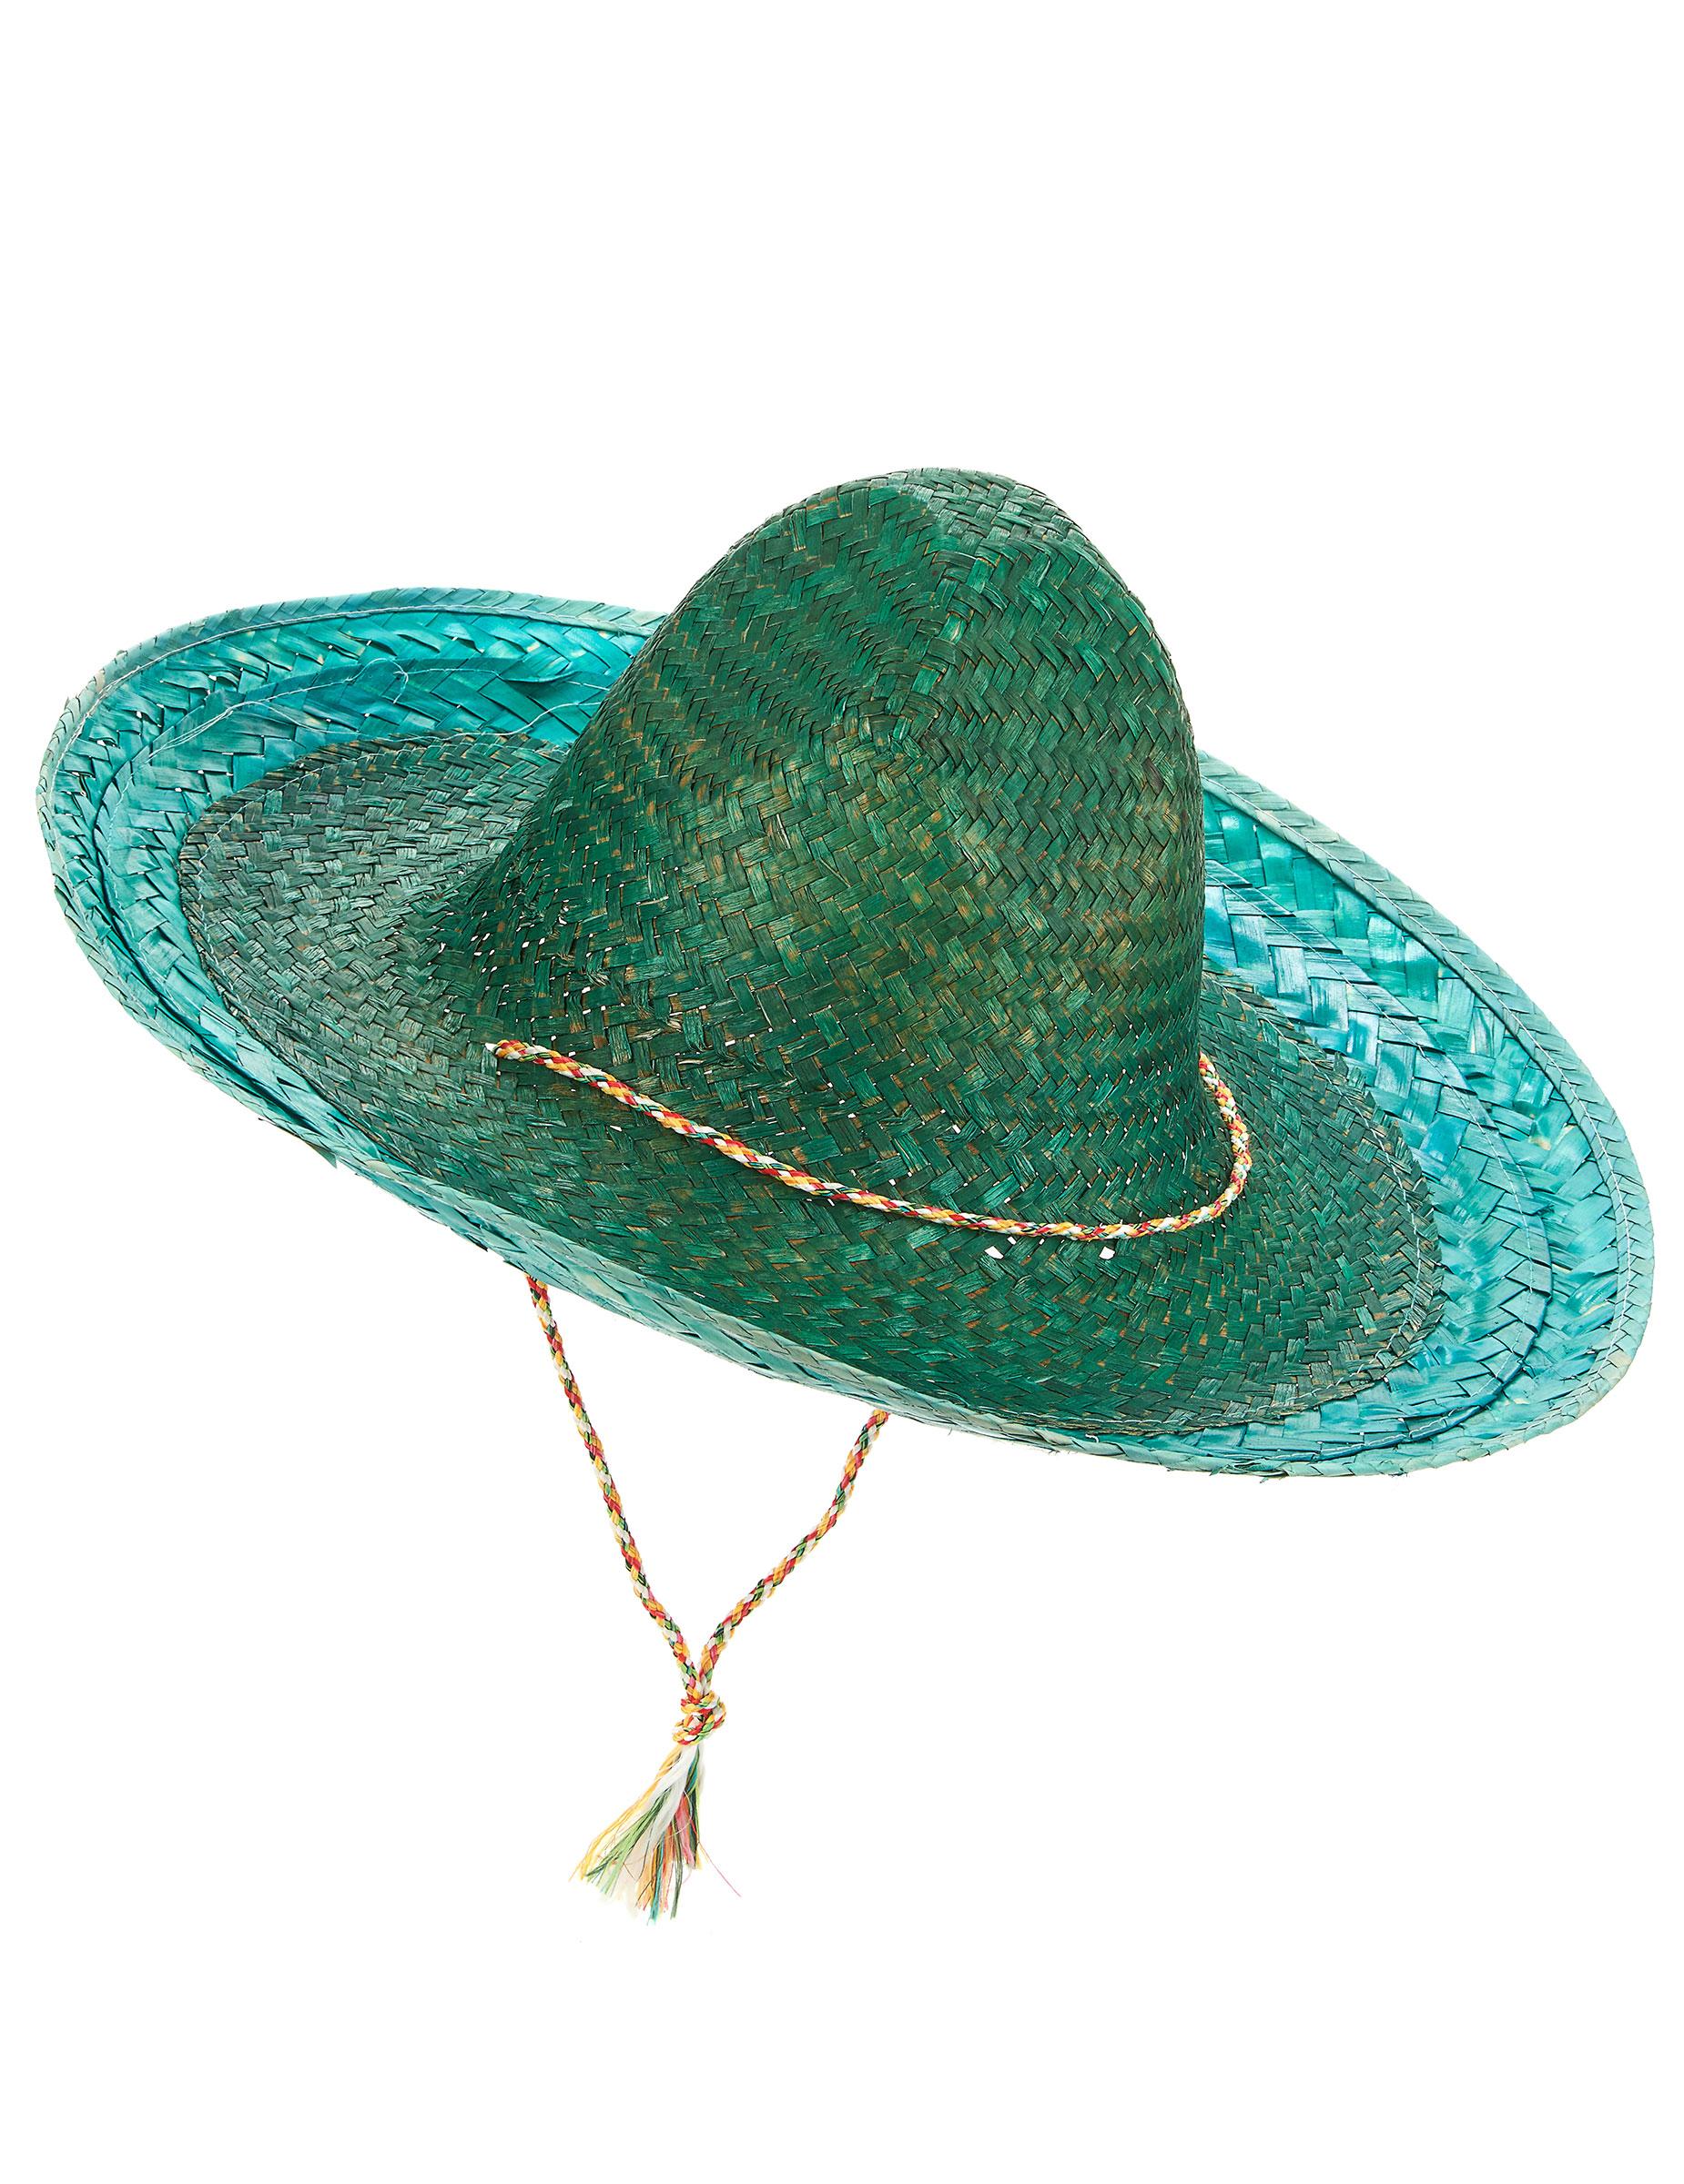 Sombrero Mexiko Hut Grun Gunstige Faschings Accessoires Zubehor